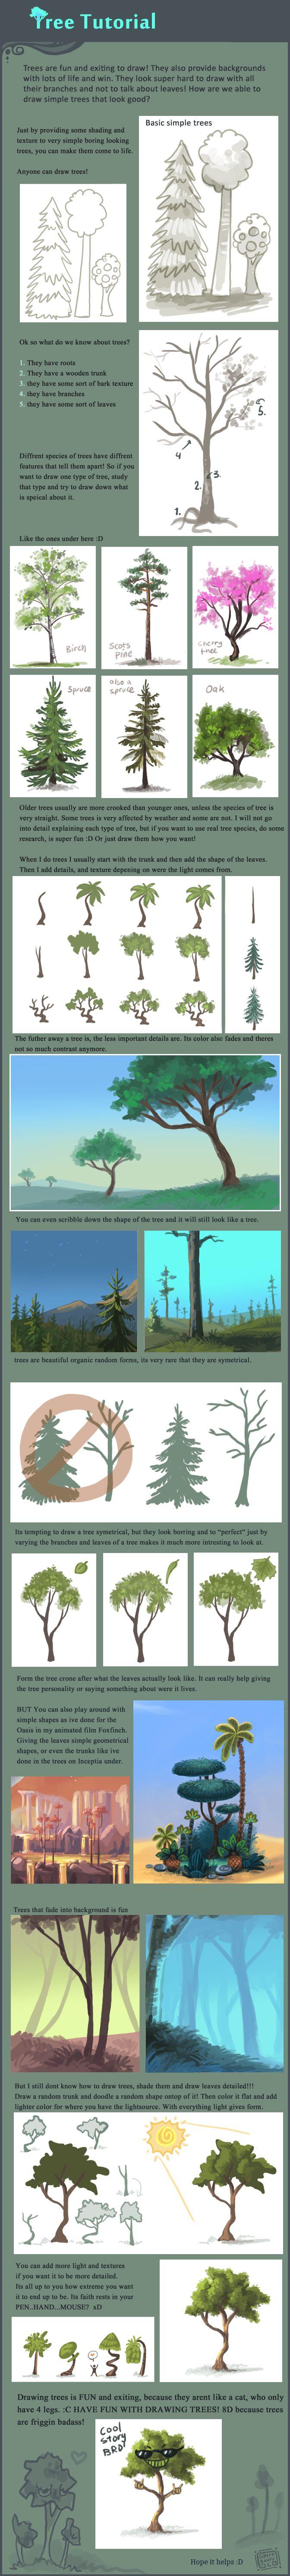 Tree tutorial by =griffsnuff on deviantART